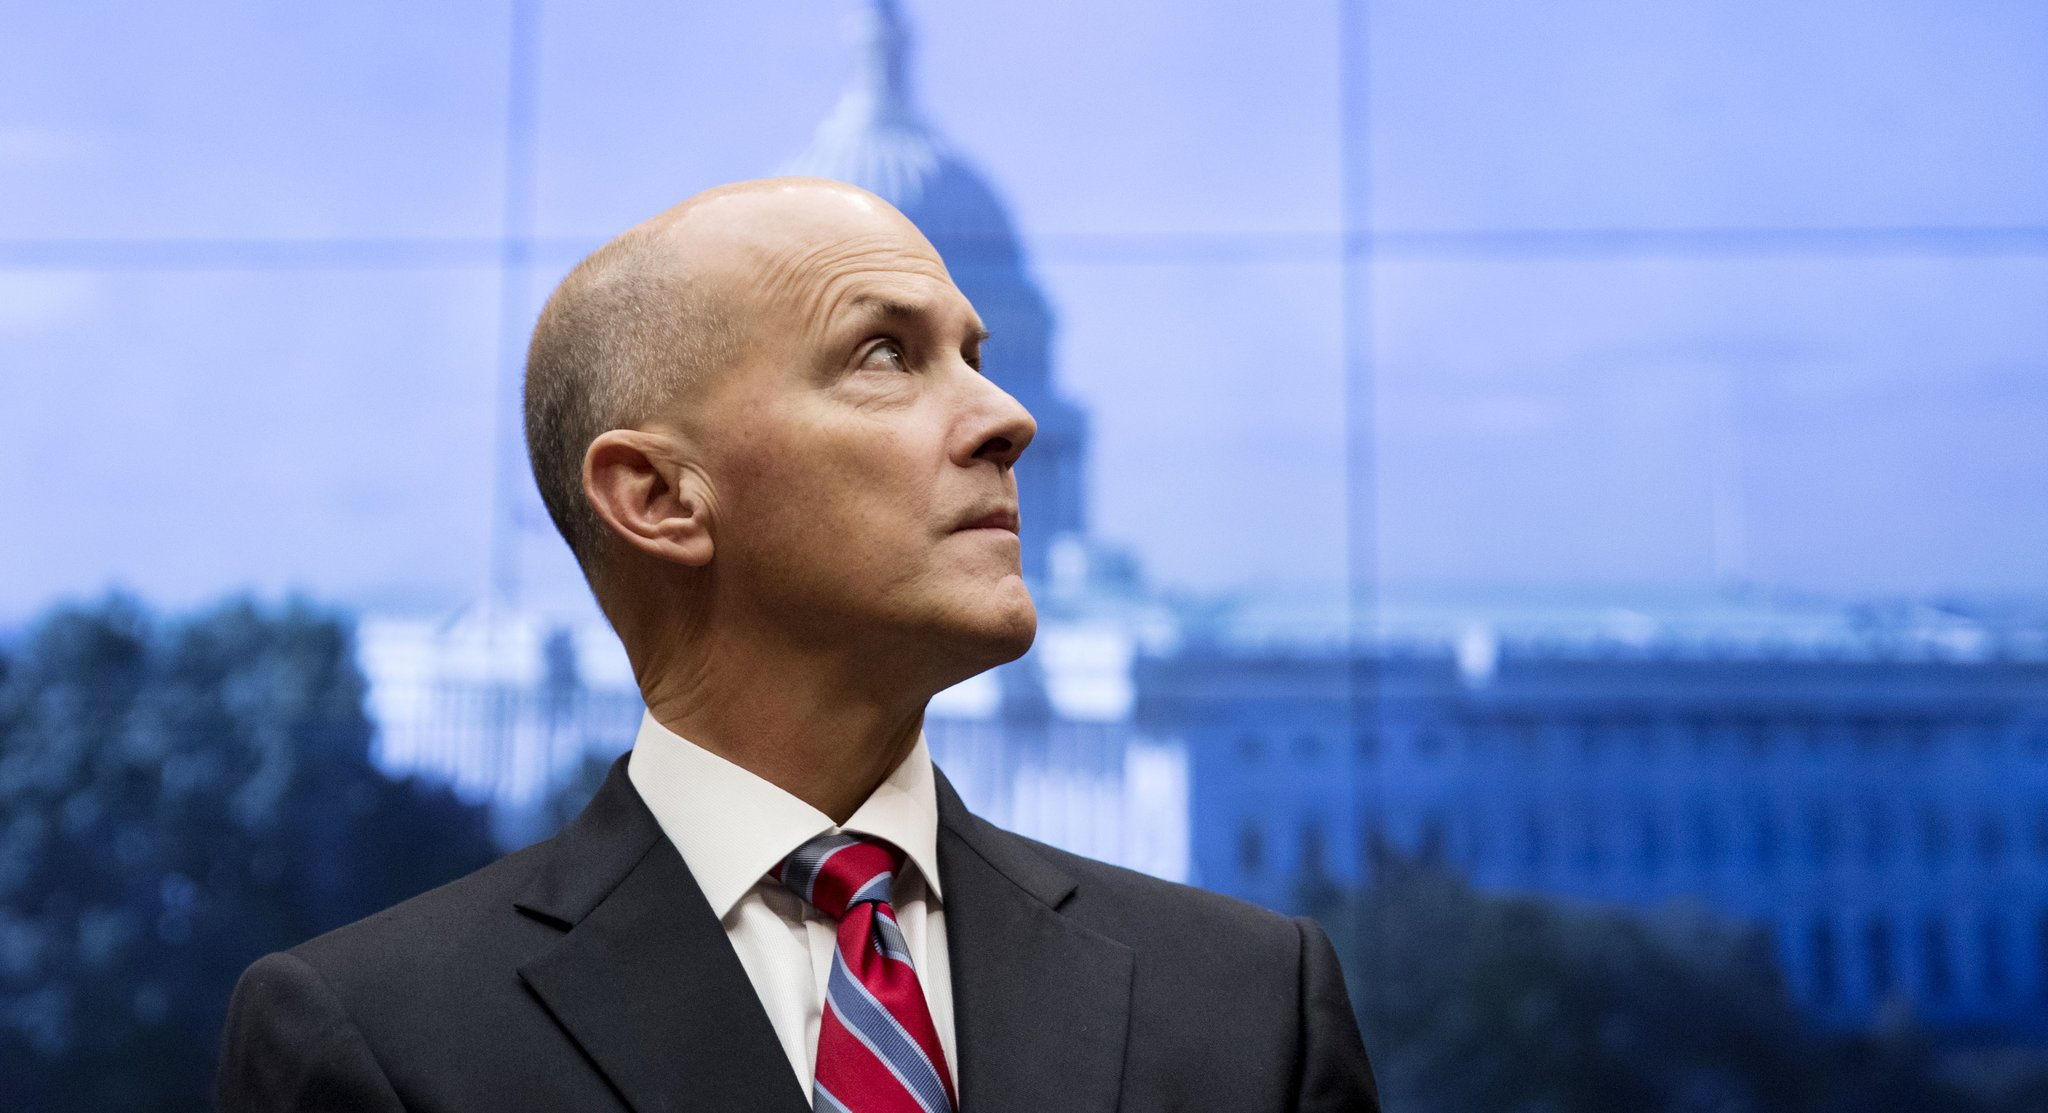 Lawmakers: Equifax should be 'shamed' https://t.co/o0MgRLCNbh via @martinmatishak https://t.co/bCqNReS4k0